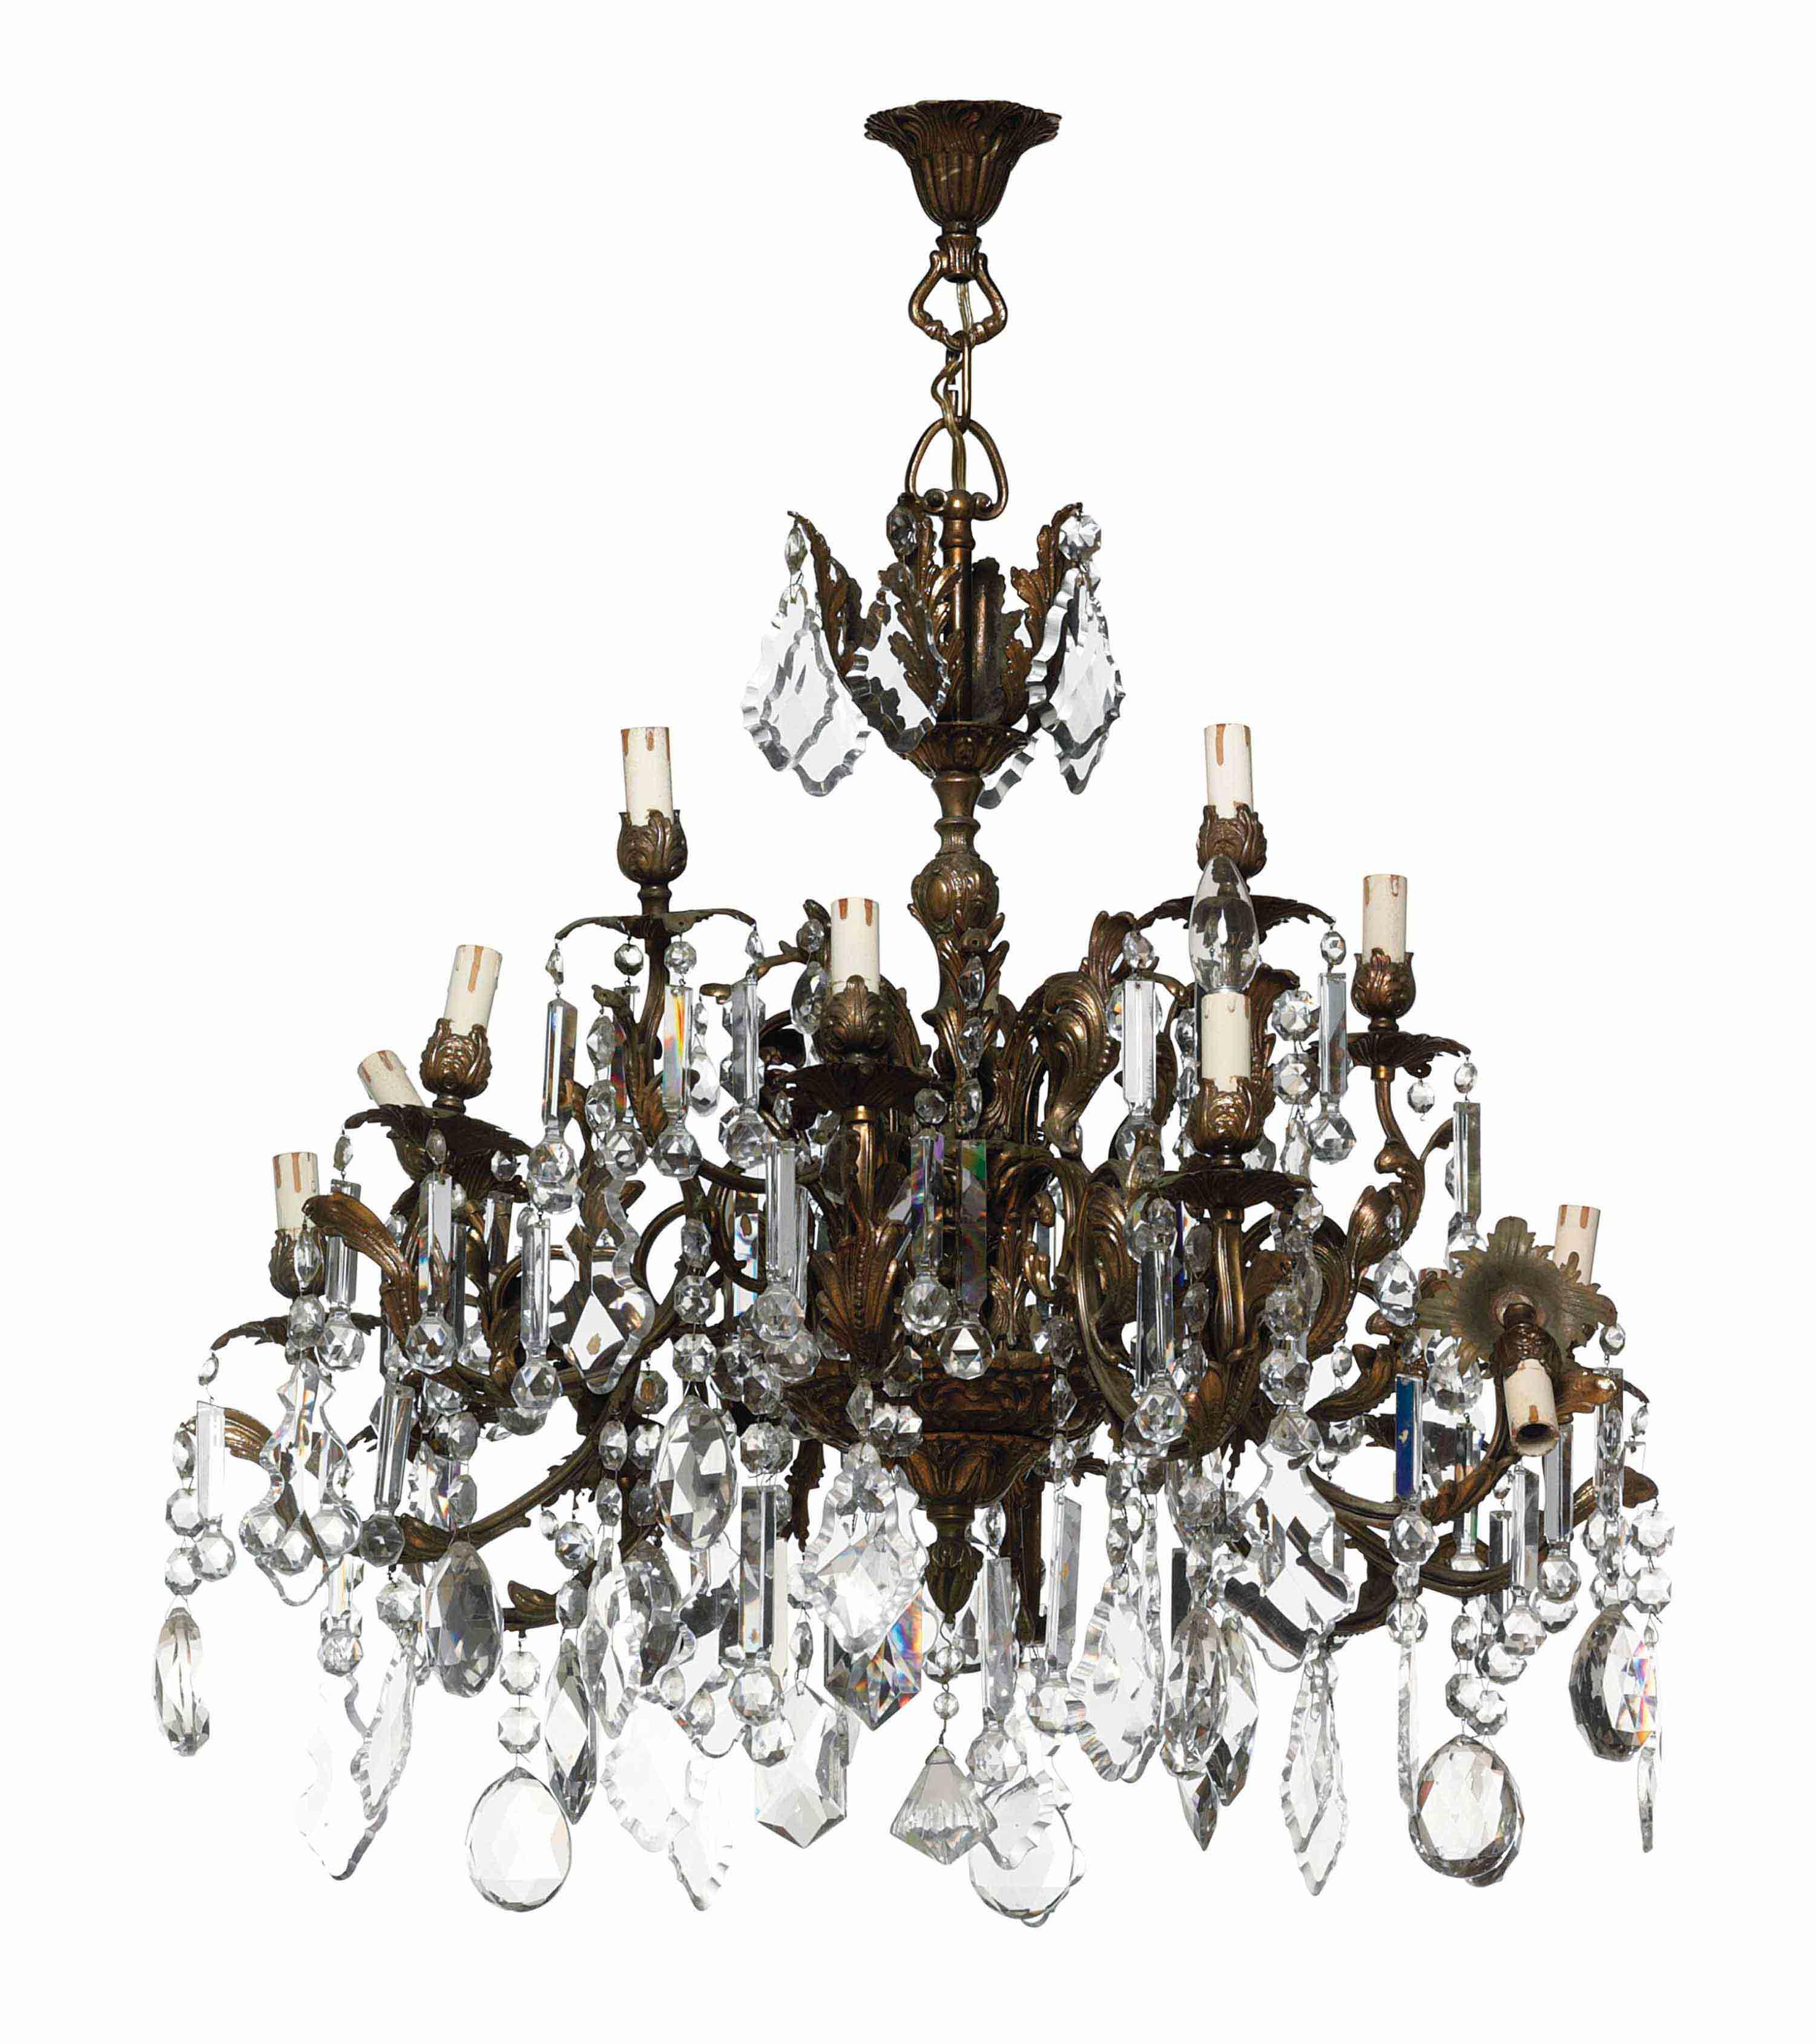 A PAIR OF GILT-METAL AND GLASS FIFTEEN-LIGHT CHANDELIERS